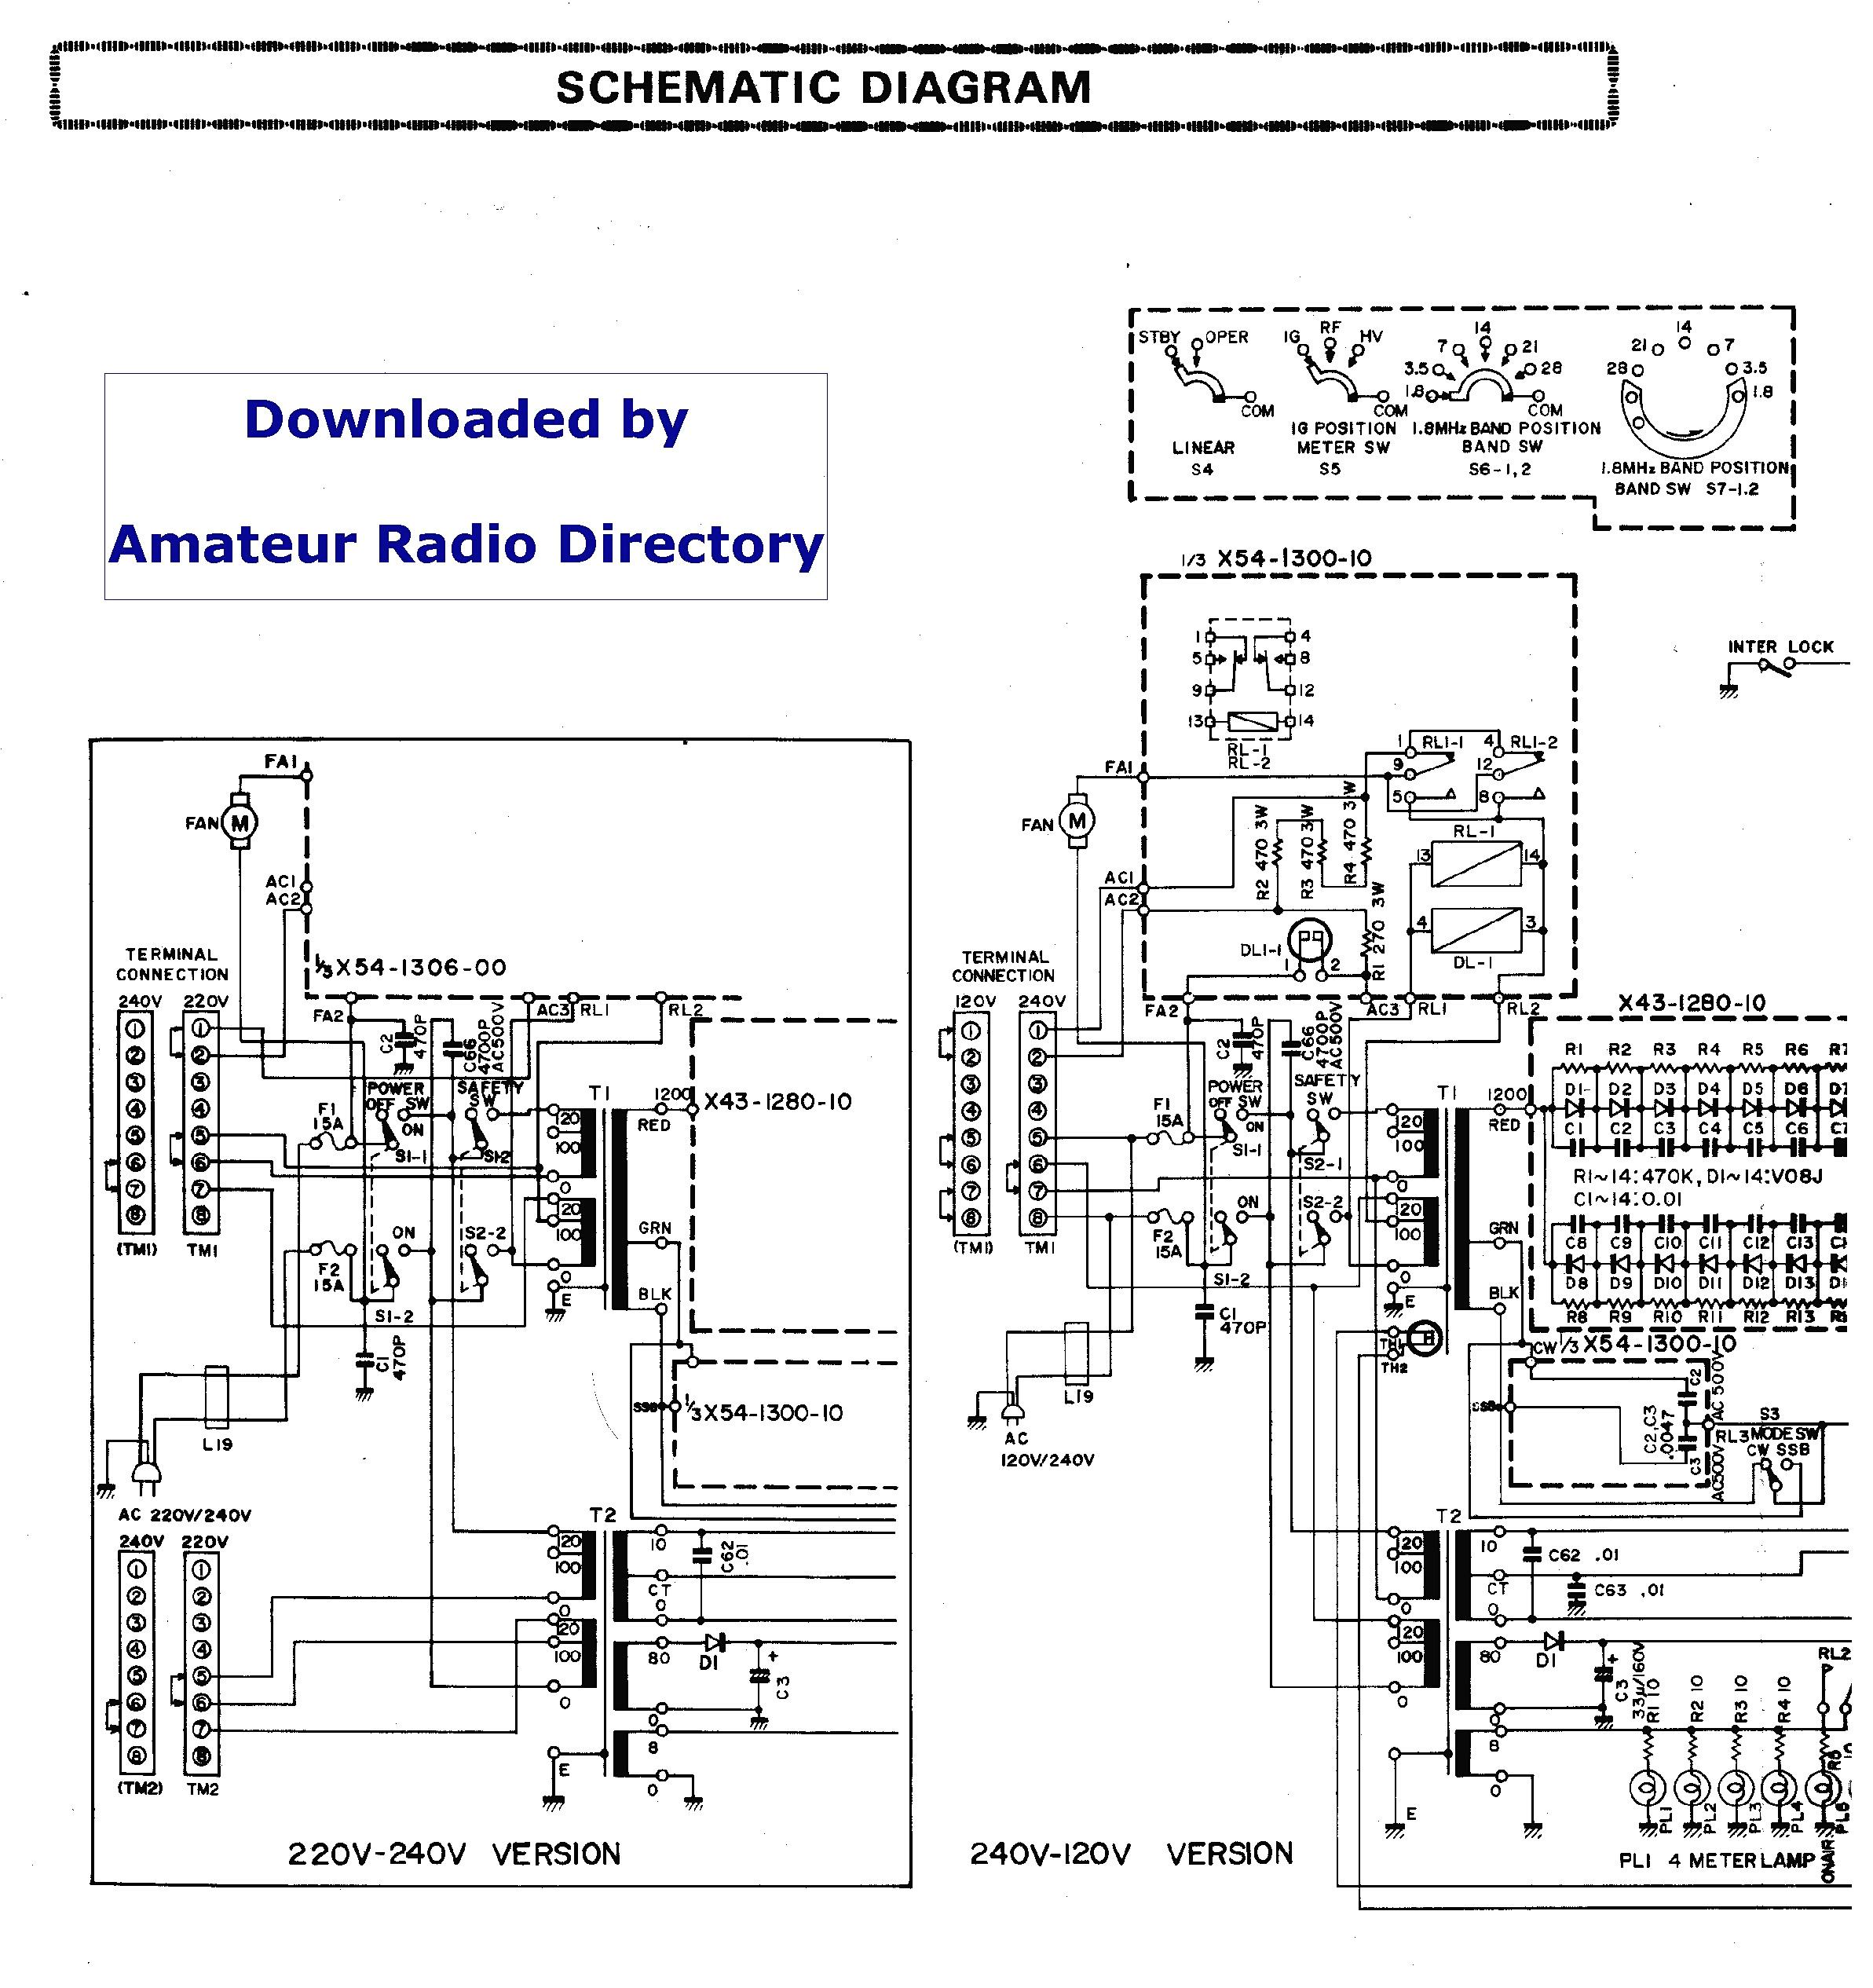 ddx7015 wiring diagram wiring diagram for kenwood ddx7015 fresh excelon amp wiring jpg